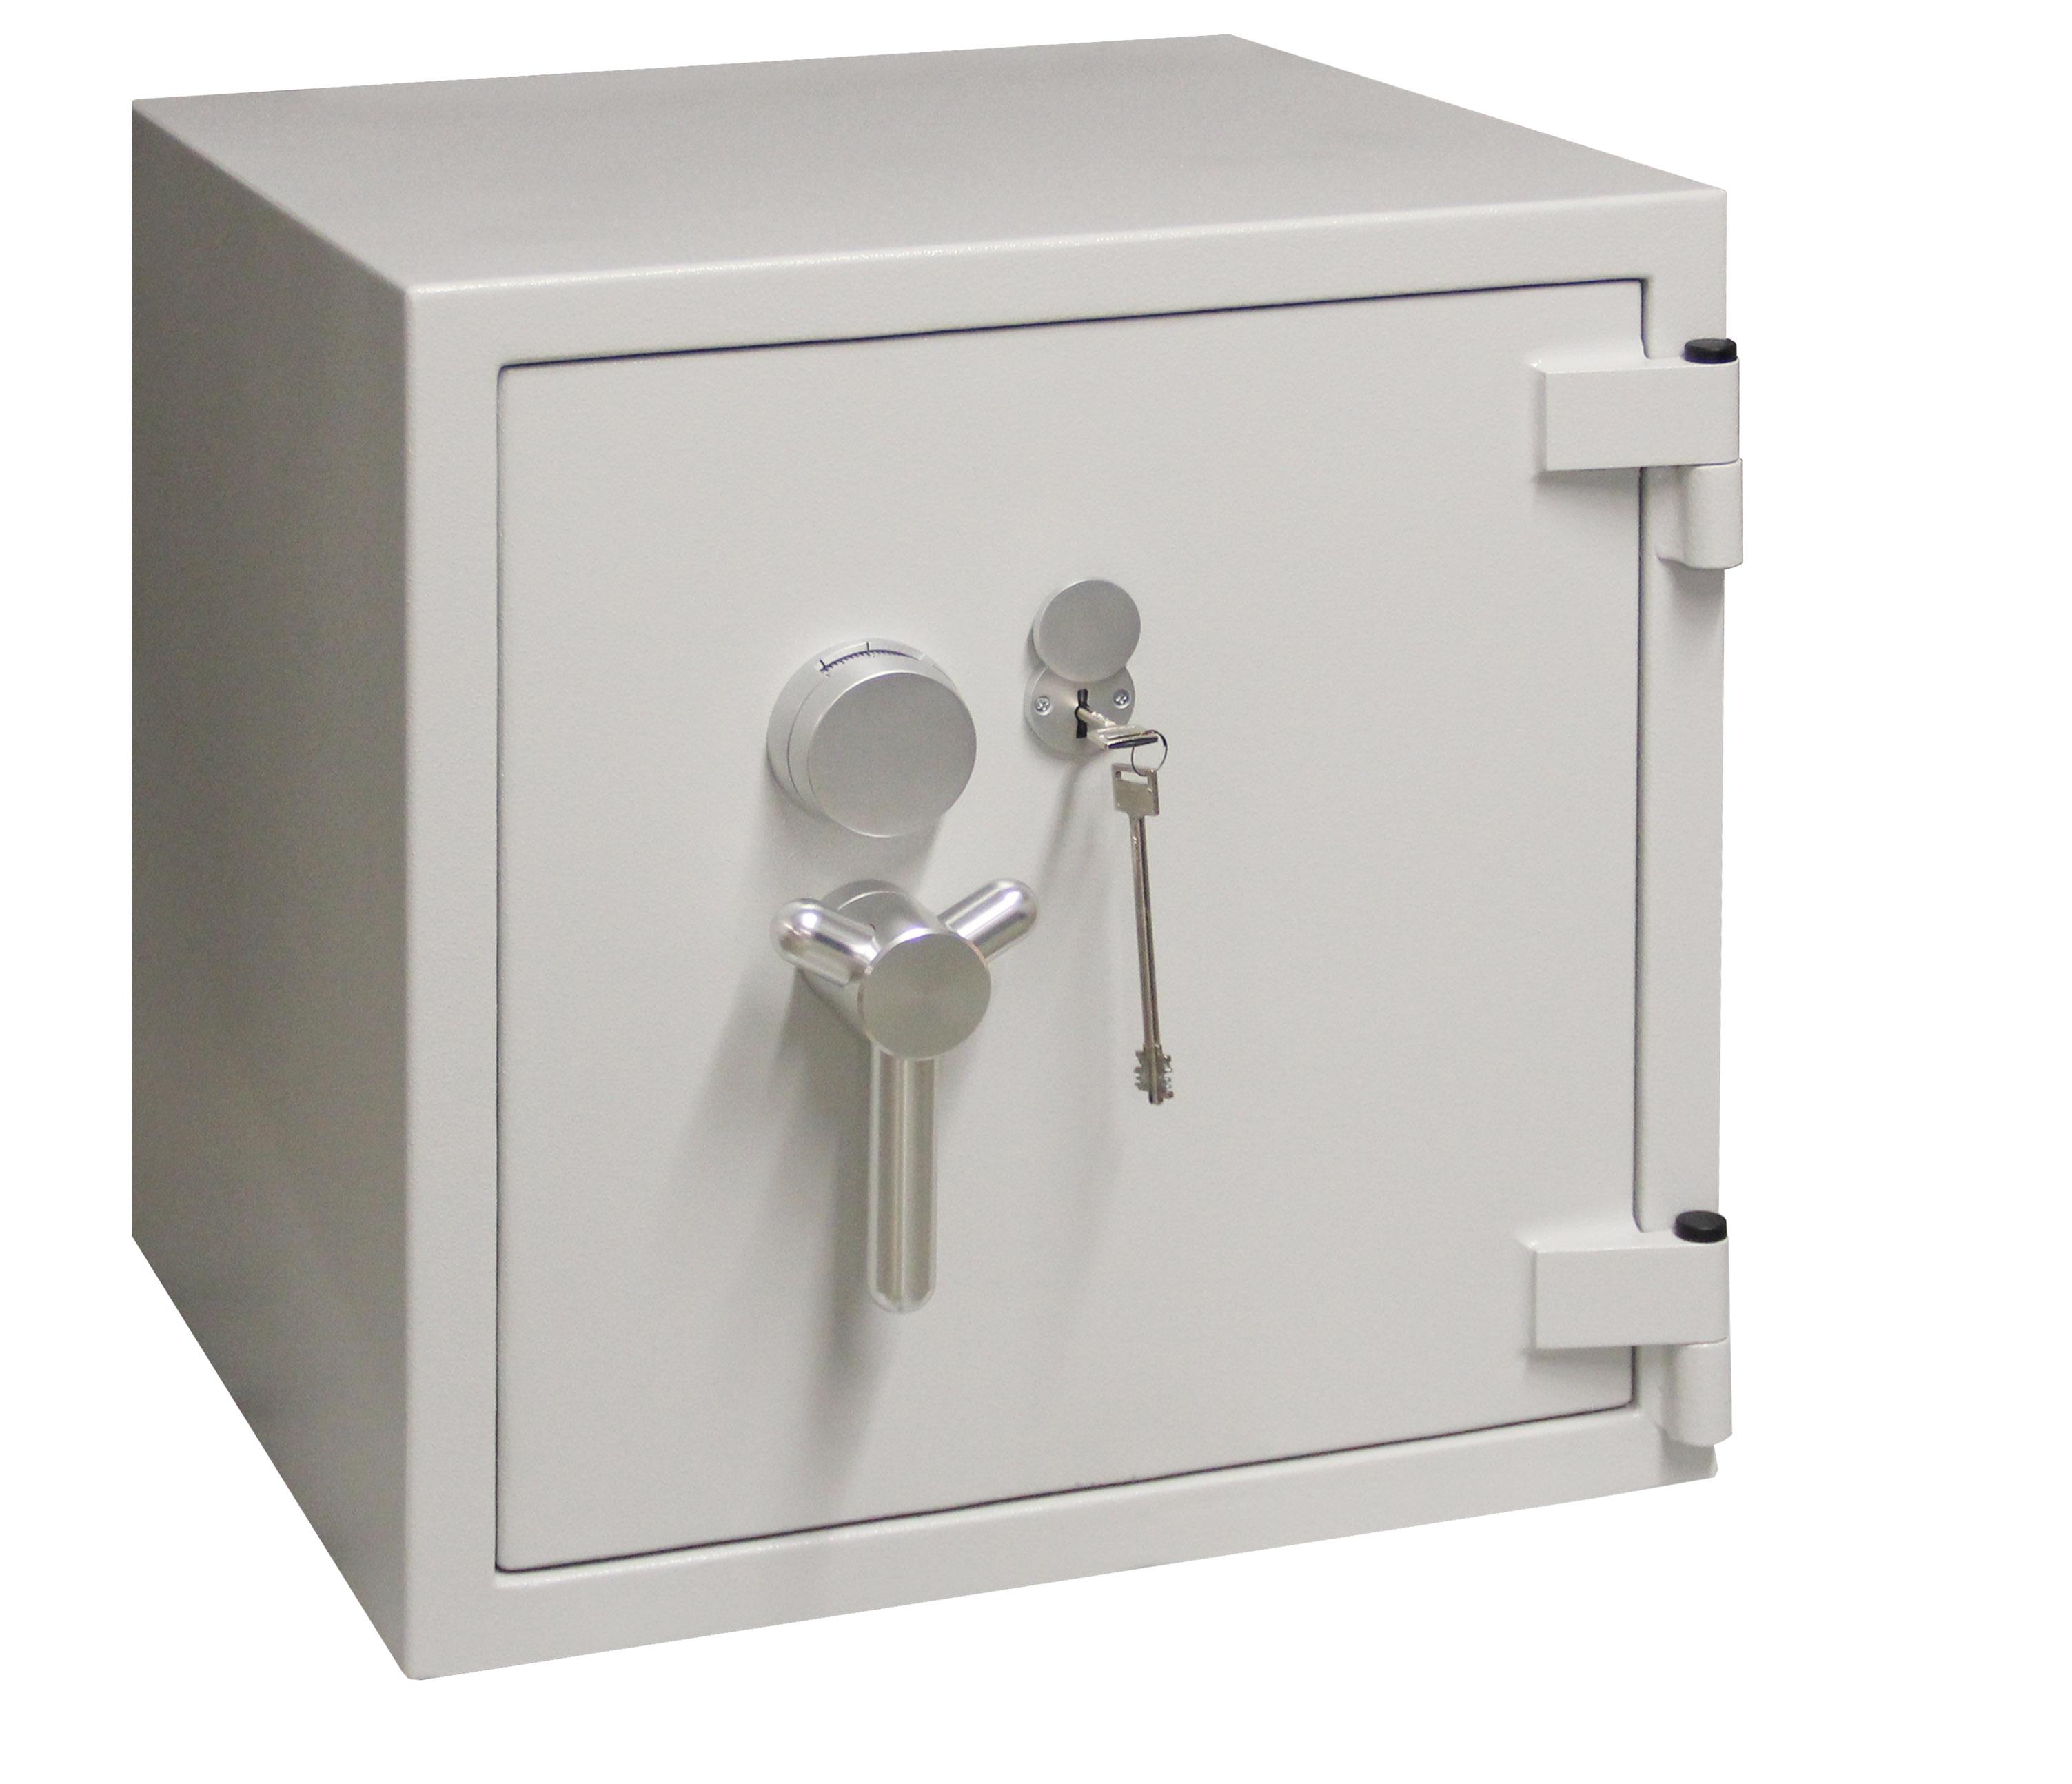 format wertschutzschrank pegasus 120 tresor vds klasse 4. Black Bedroom Furniture Sets. Home Design Ideas